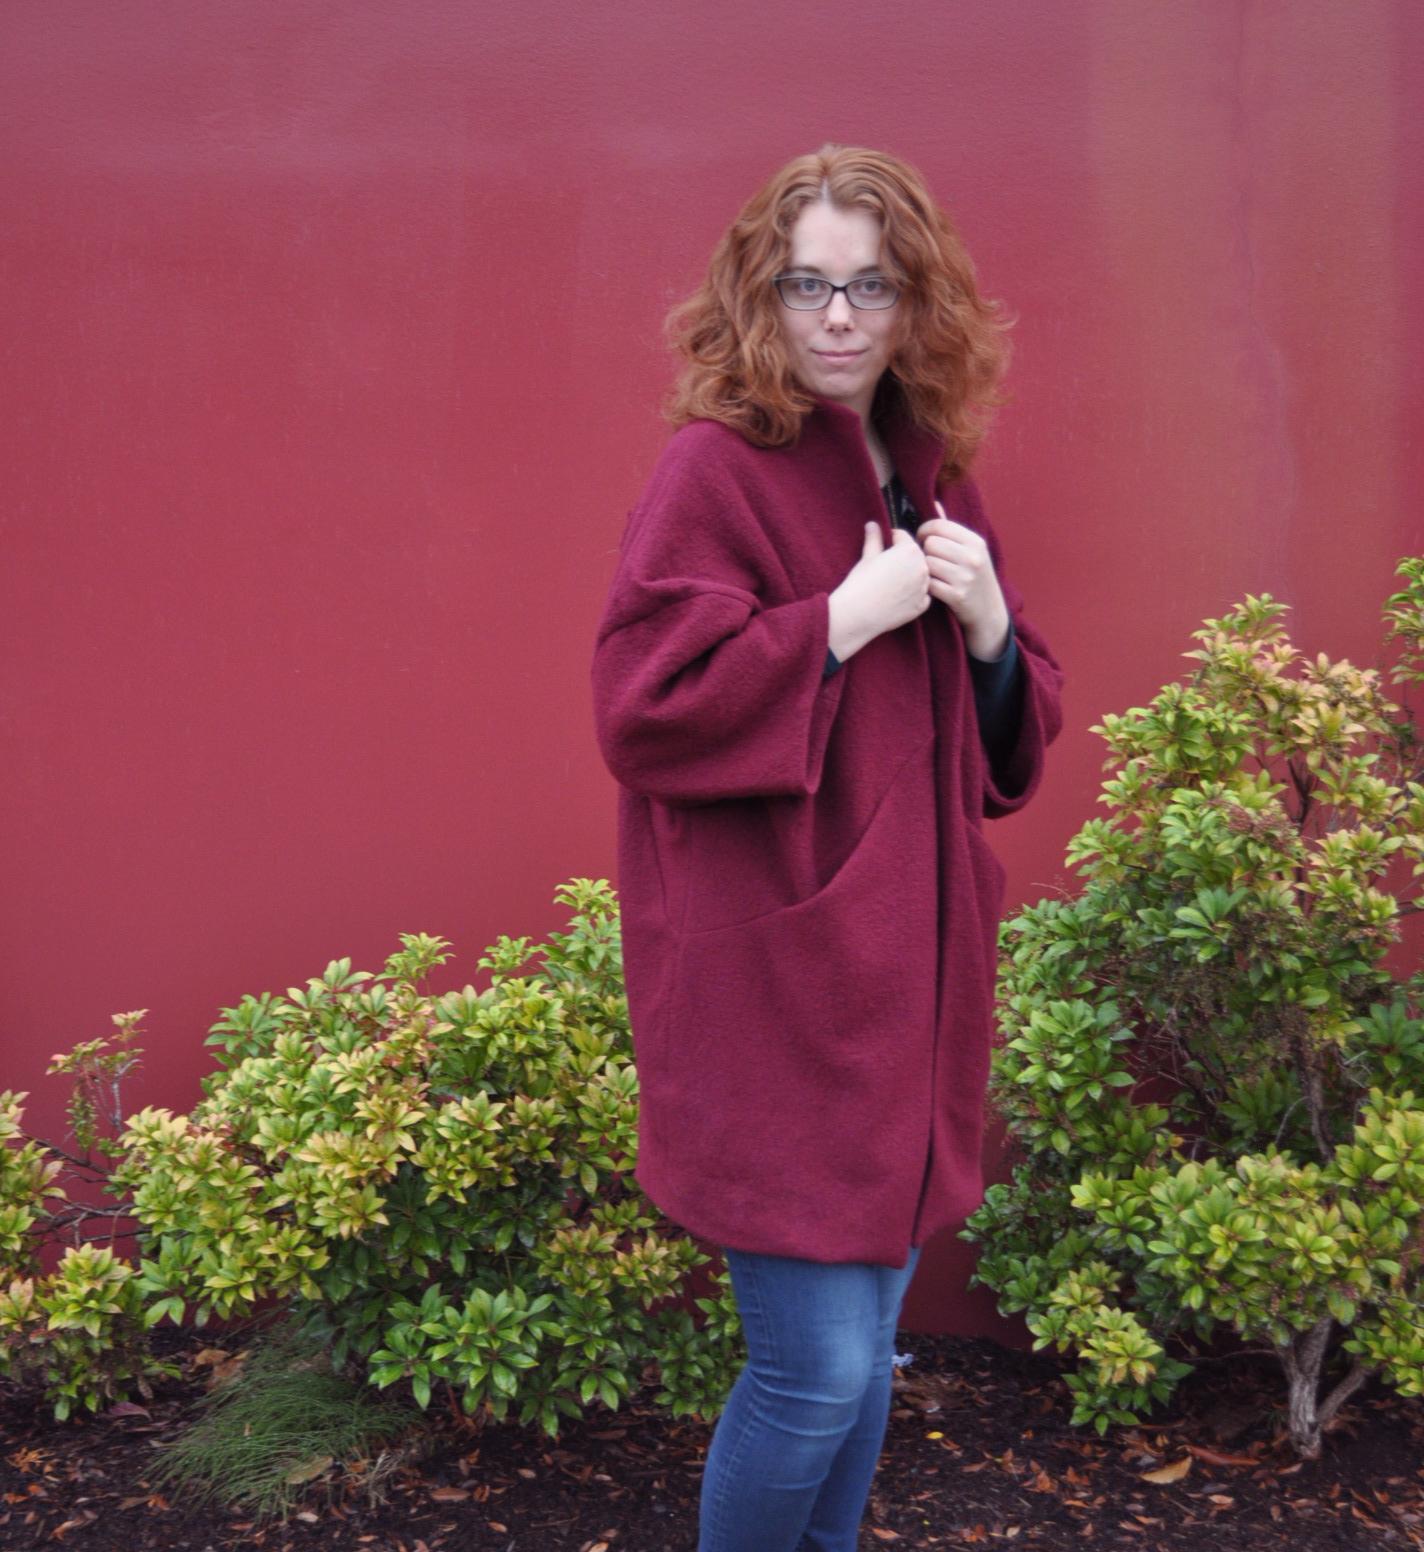 Sapporo Coat Front Collar | Style Maker Fabrics